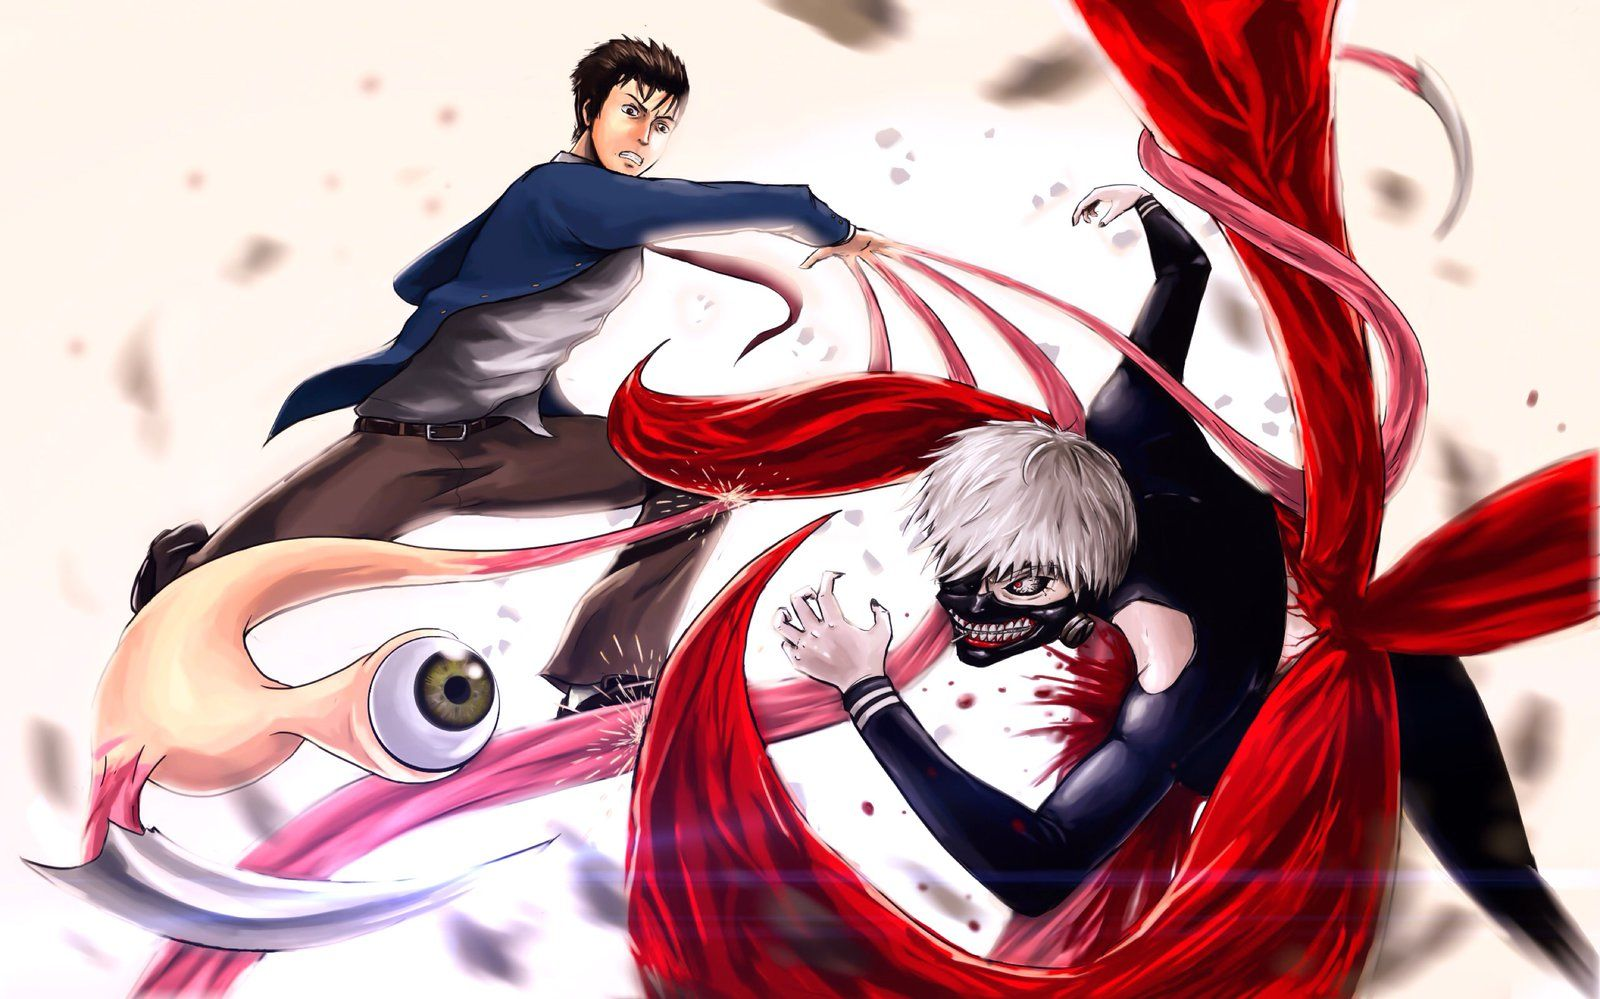 Pin on Favourite Anime/Manga Art